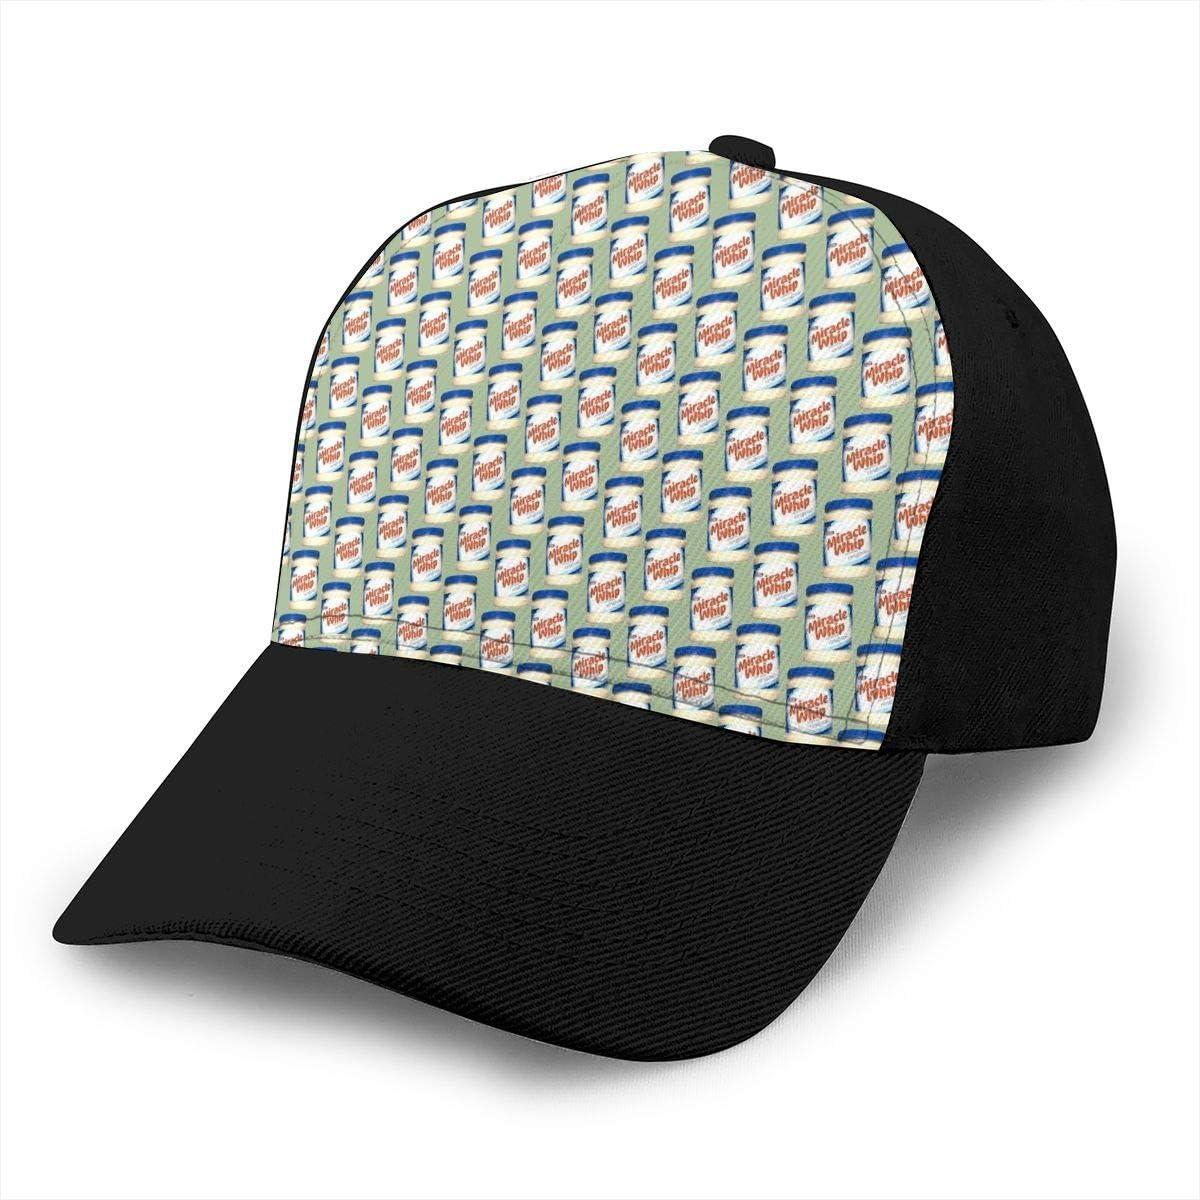 XIKEWL Kraft Miracle Whip Unisex Adjustable Baseball Cap Fashion Hip Hop Caps Dad Hat Black